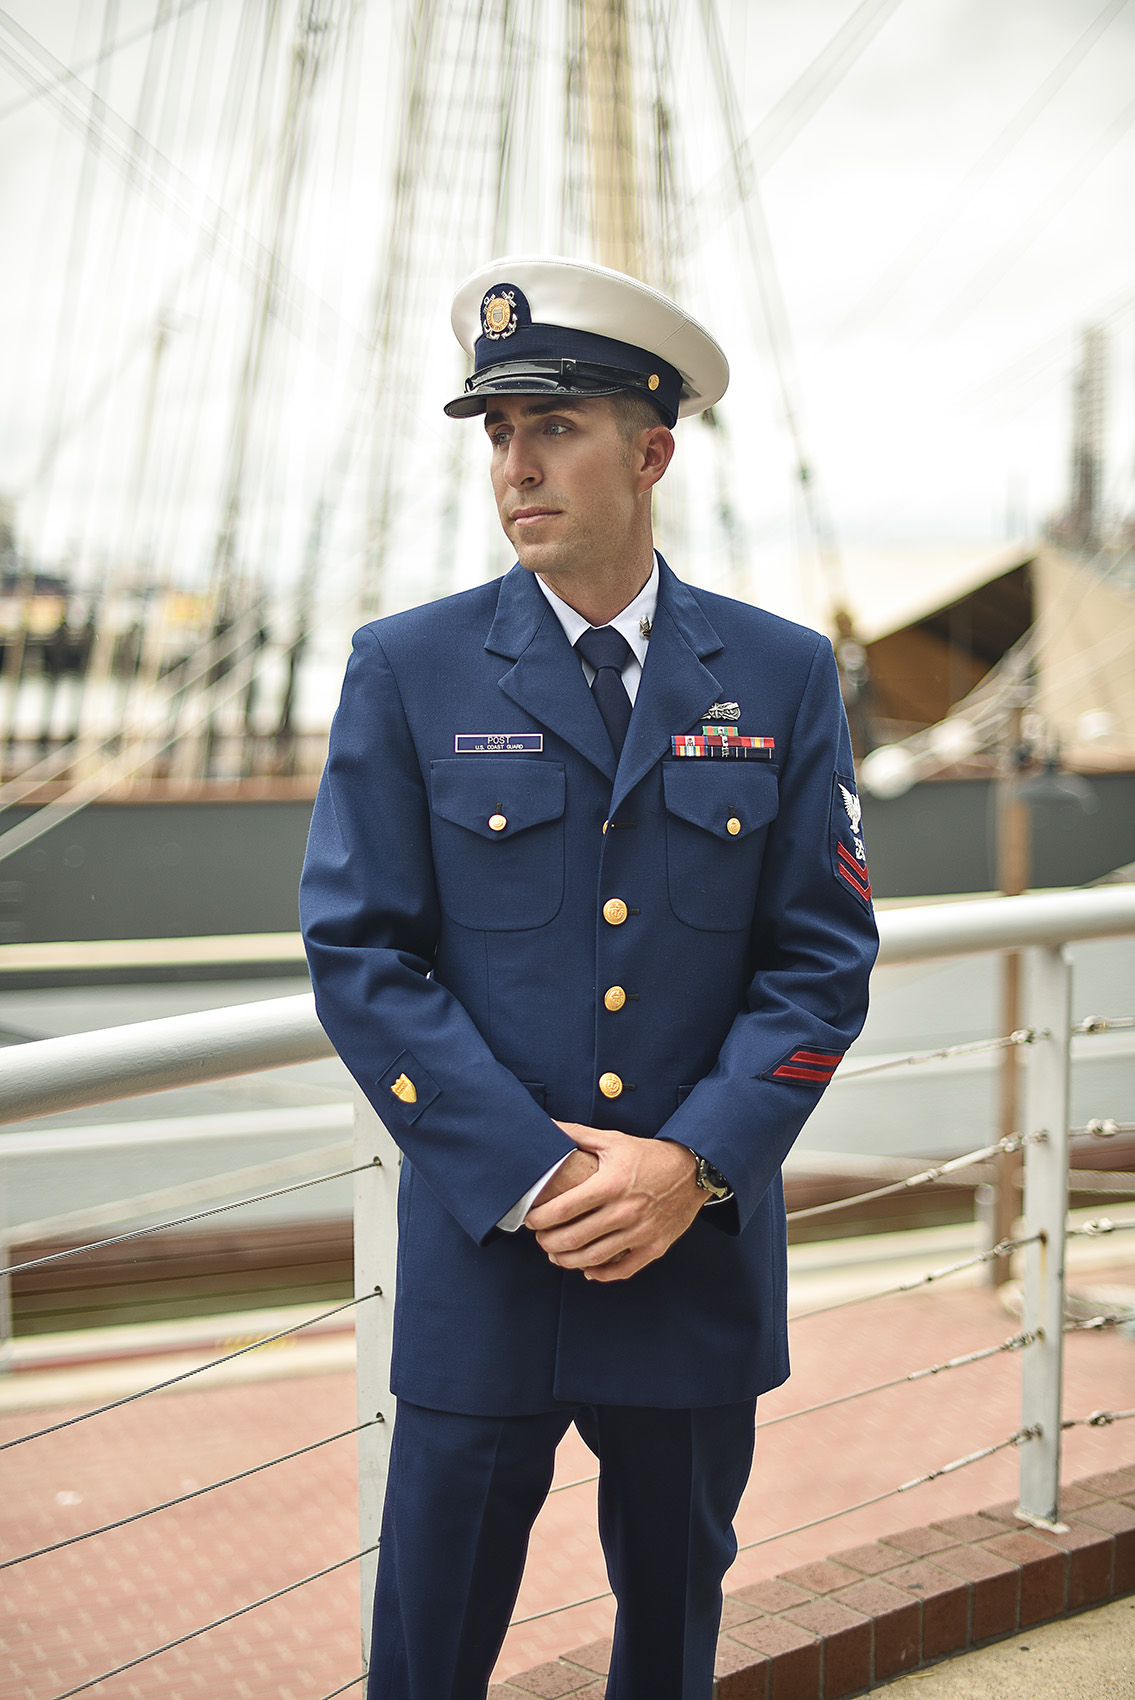 Houston Modern Classy Romantic Military Coastgaurd wedding